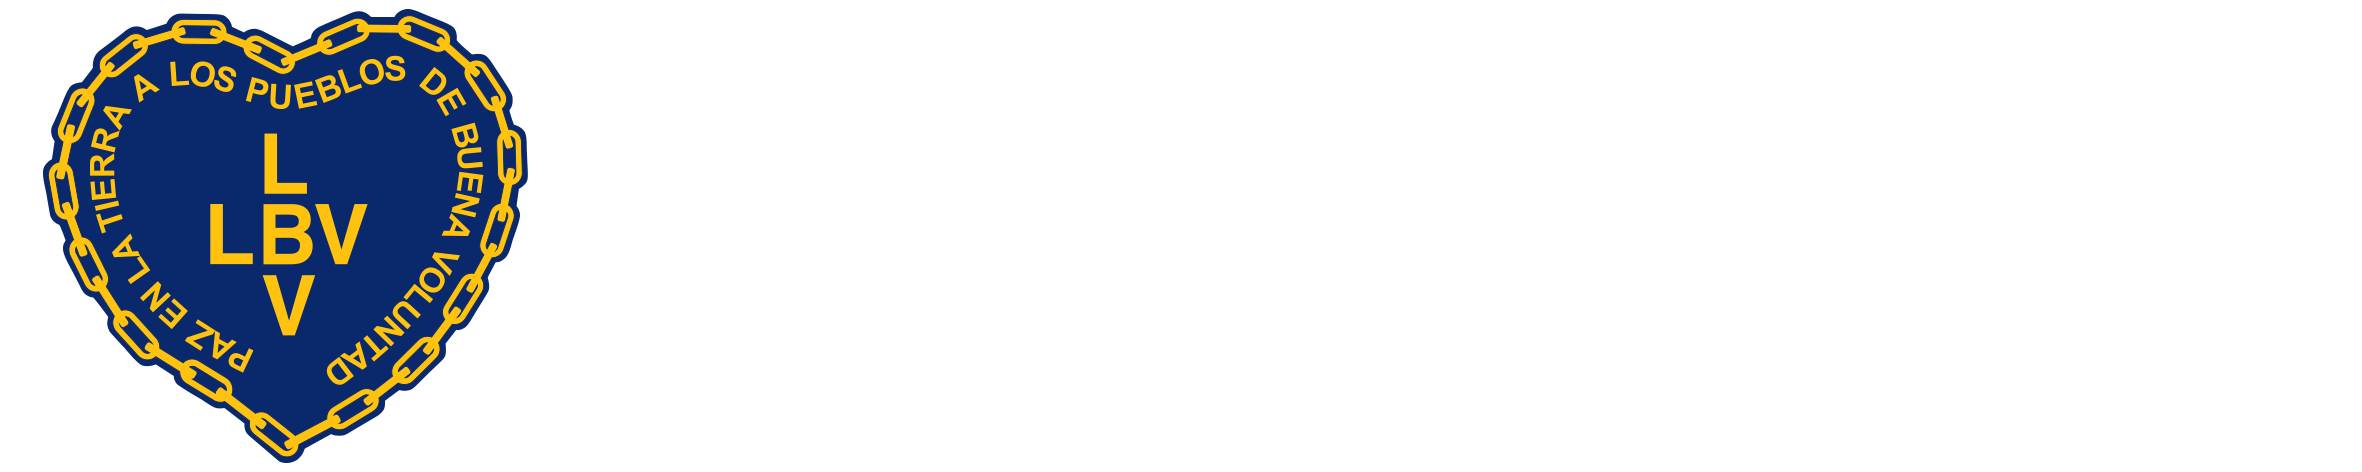 LBV Bolivia